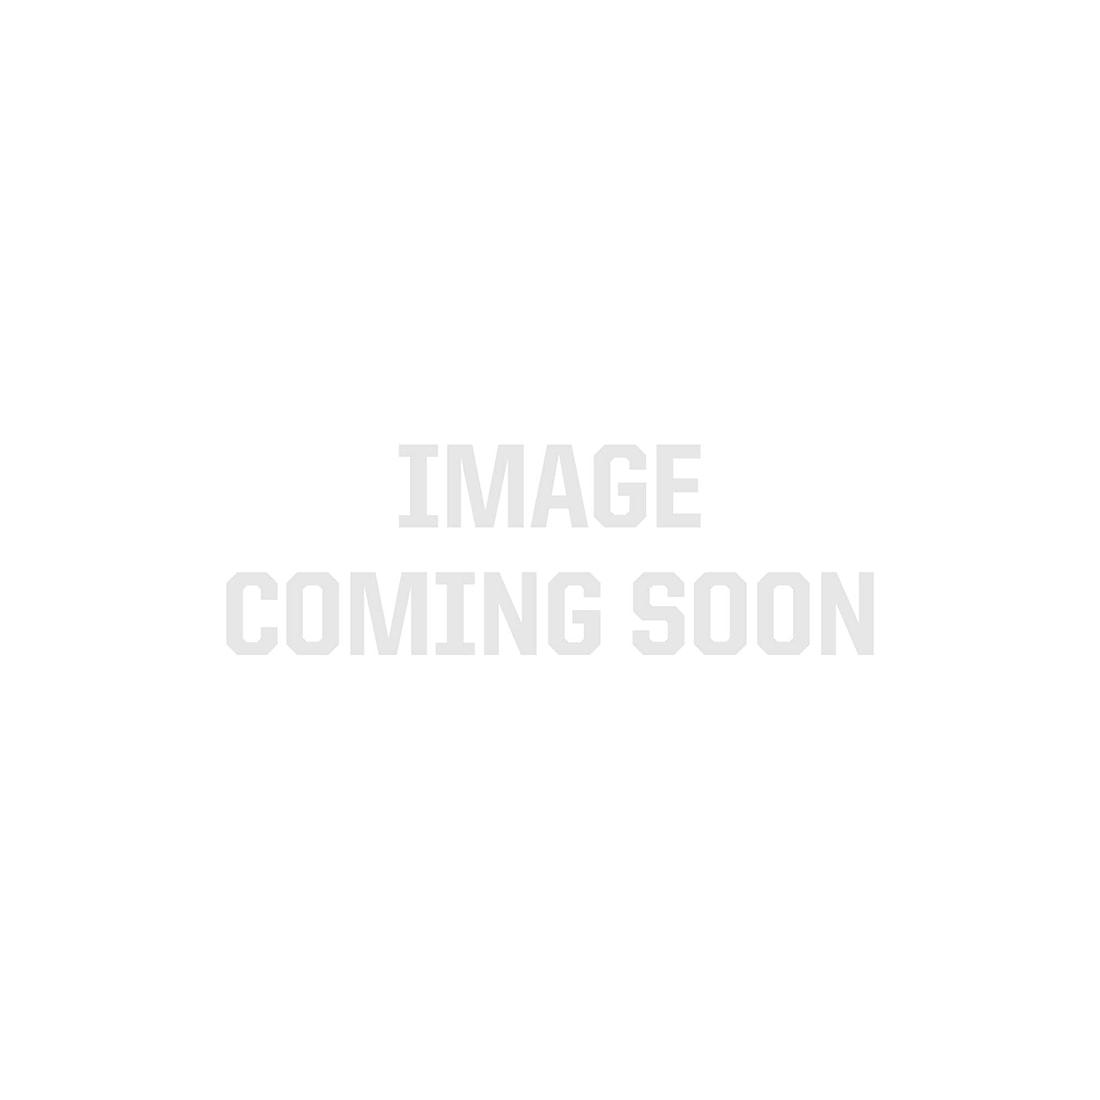 Dimmable 6 inch LED Downlight Retrofit Fixture 12 Watt 120 VAC Warm White 2,700K MaxLite